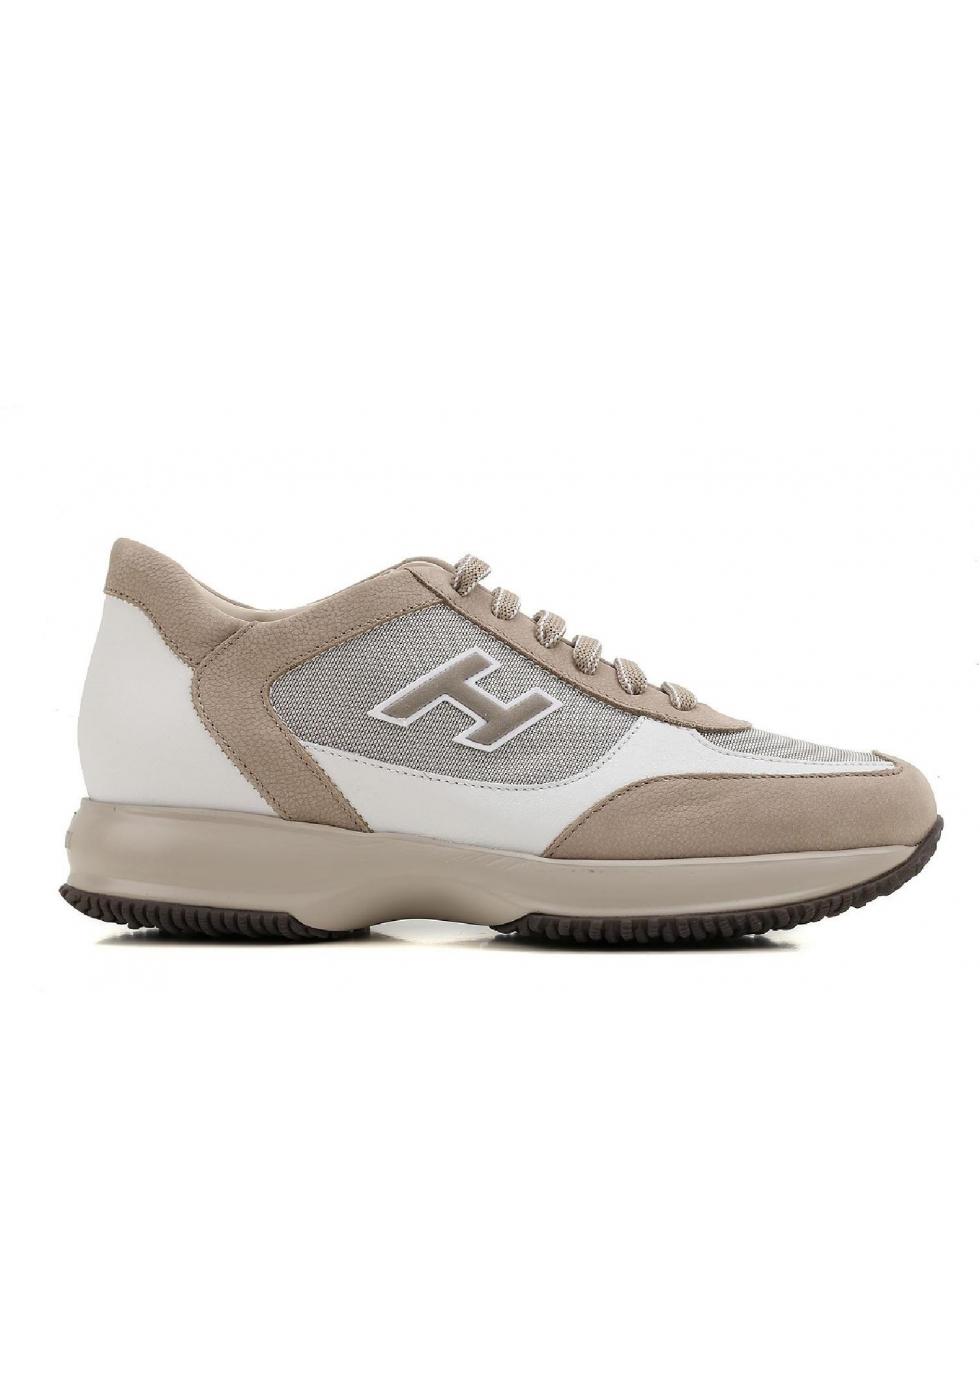 23d060e241d3c Sneakers Hogan Interactive uomo in nabuk e pelle - Italian Boutique